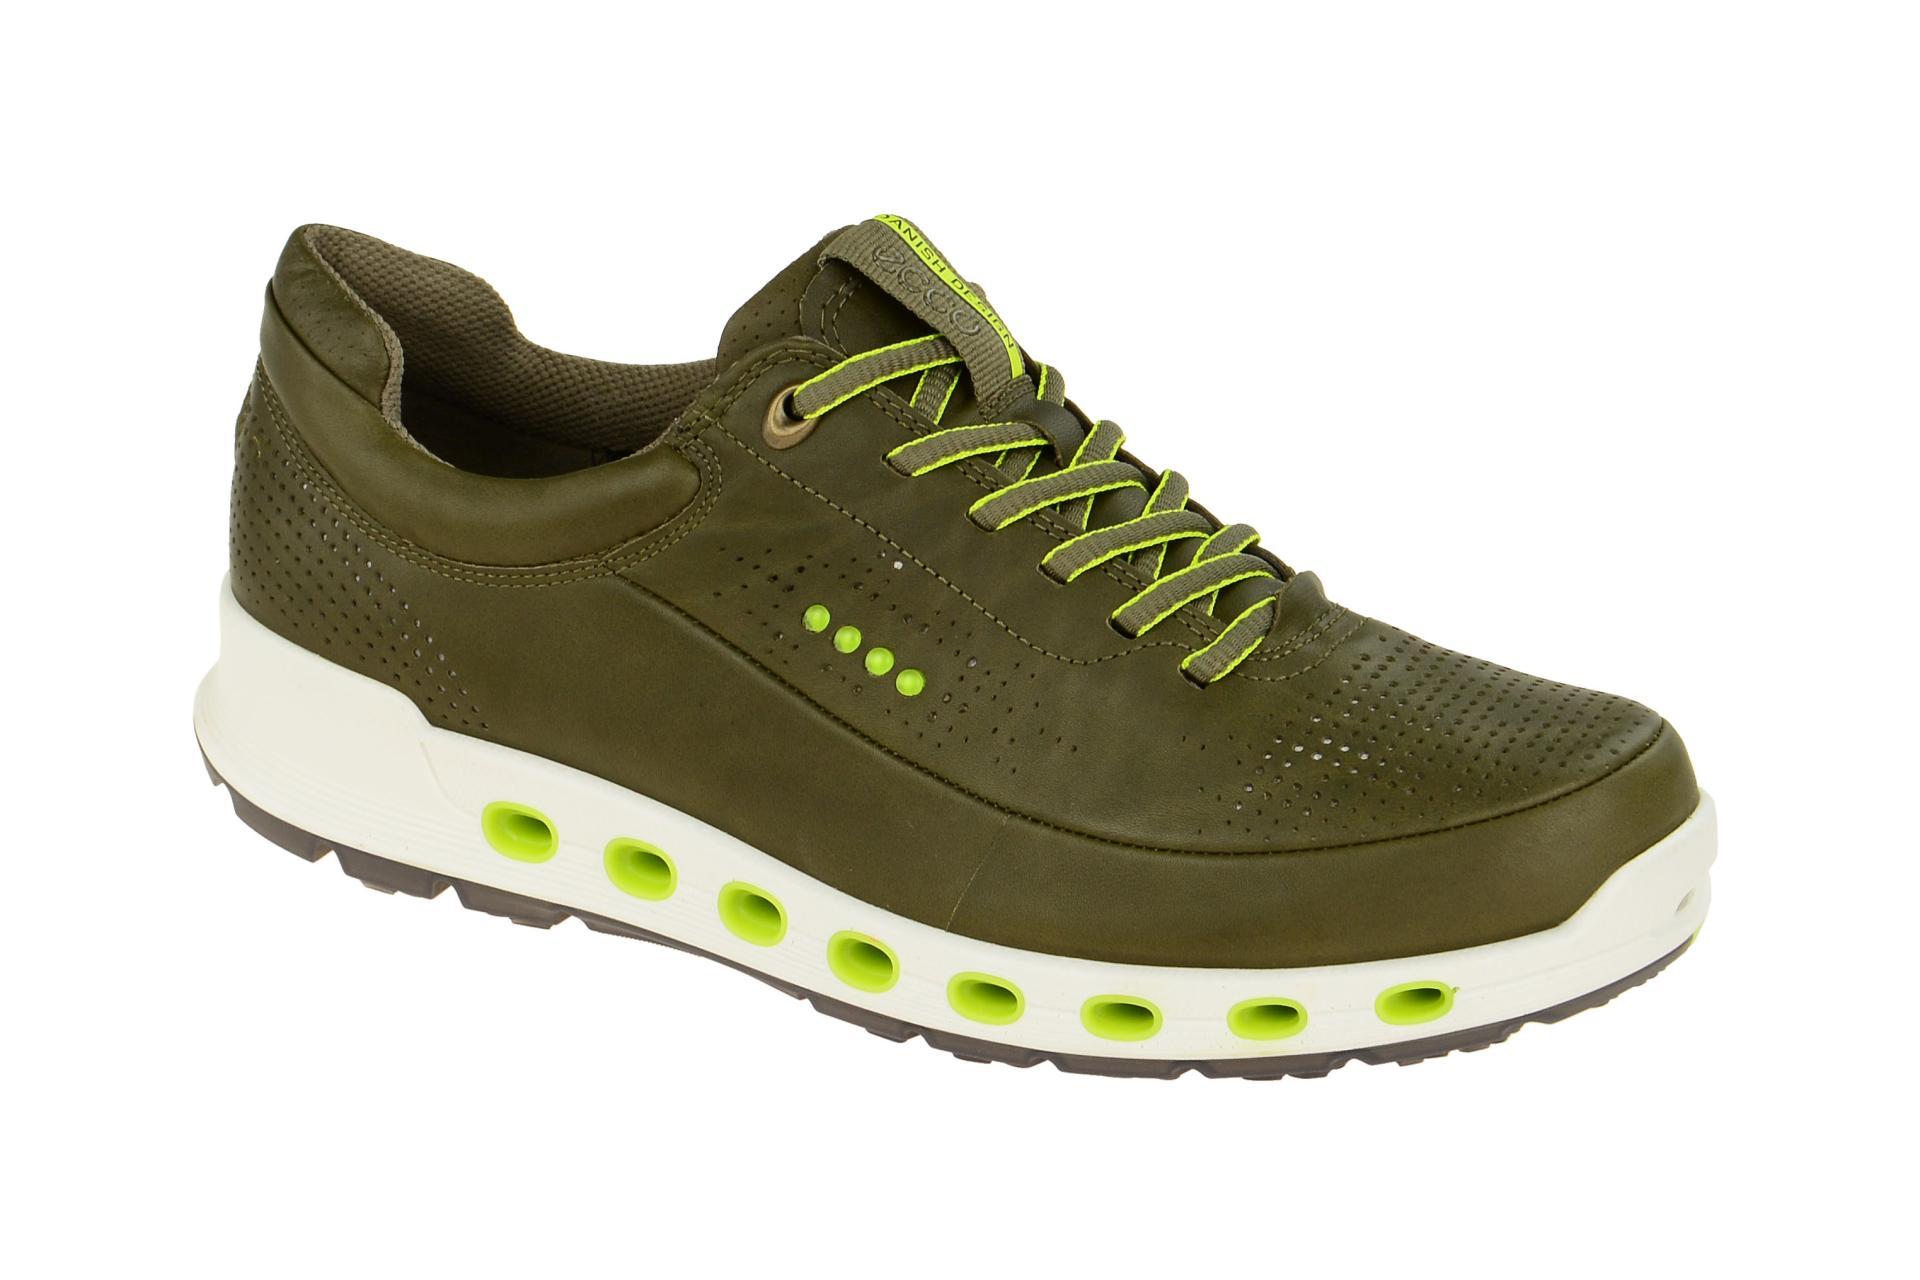 low priced 44703 73c18 Details zu Ecco Schuhe COOL 2.0 grün Herrenschuhe Sneakers 84251401543 NEU